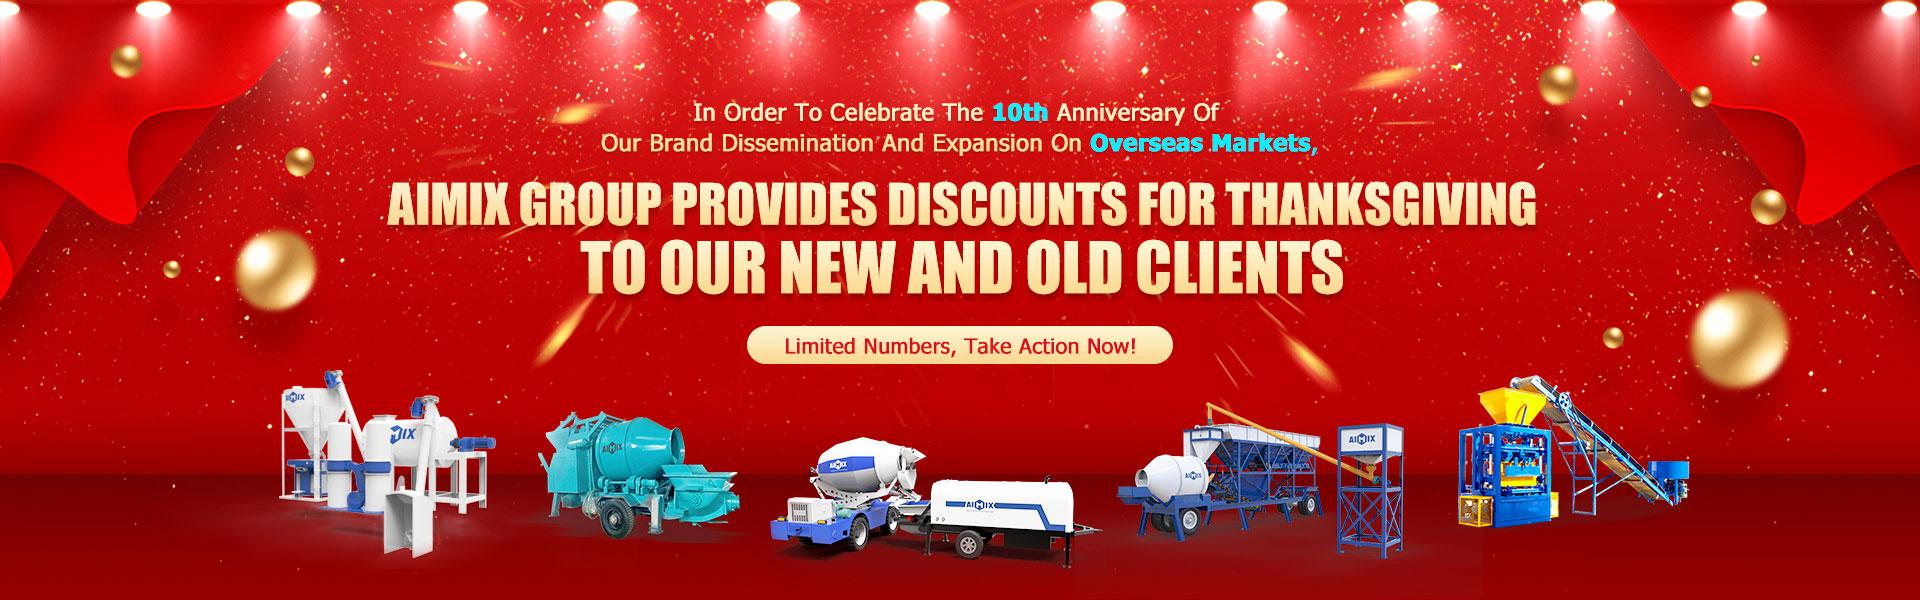 Aimix discount banner